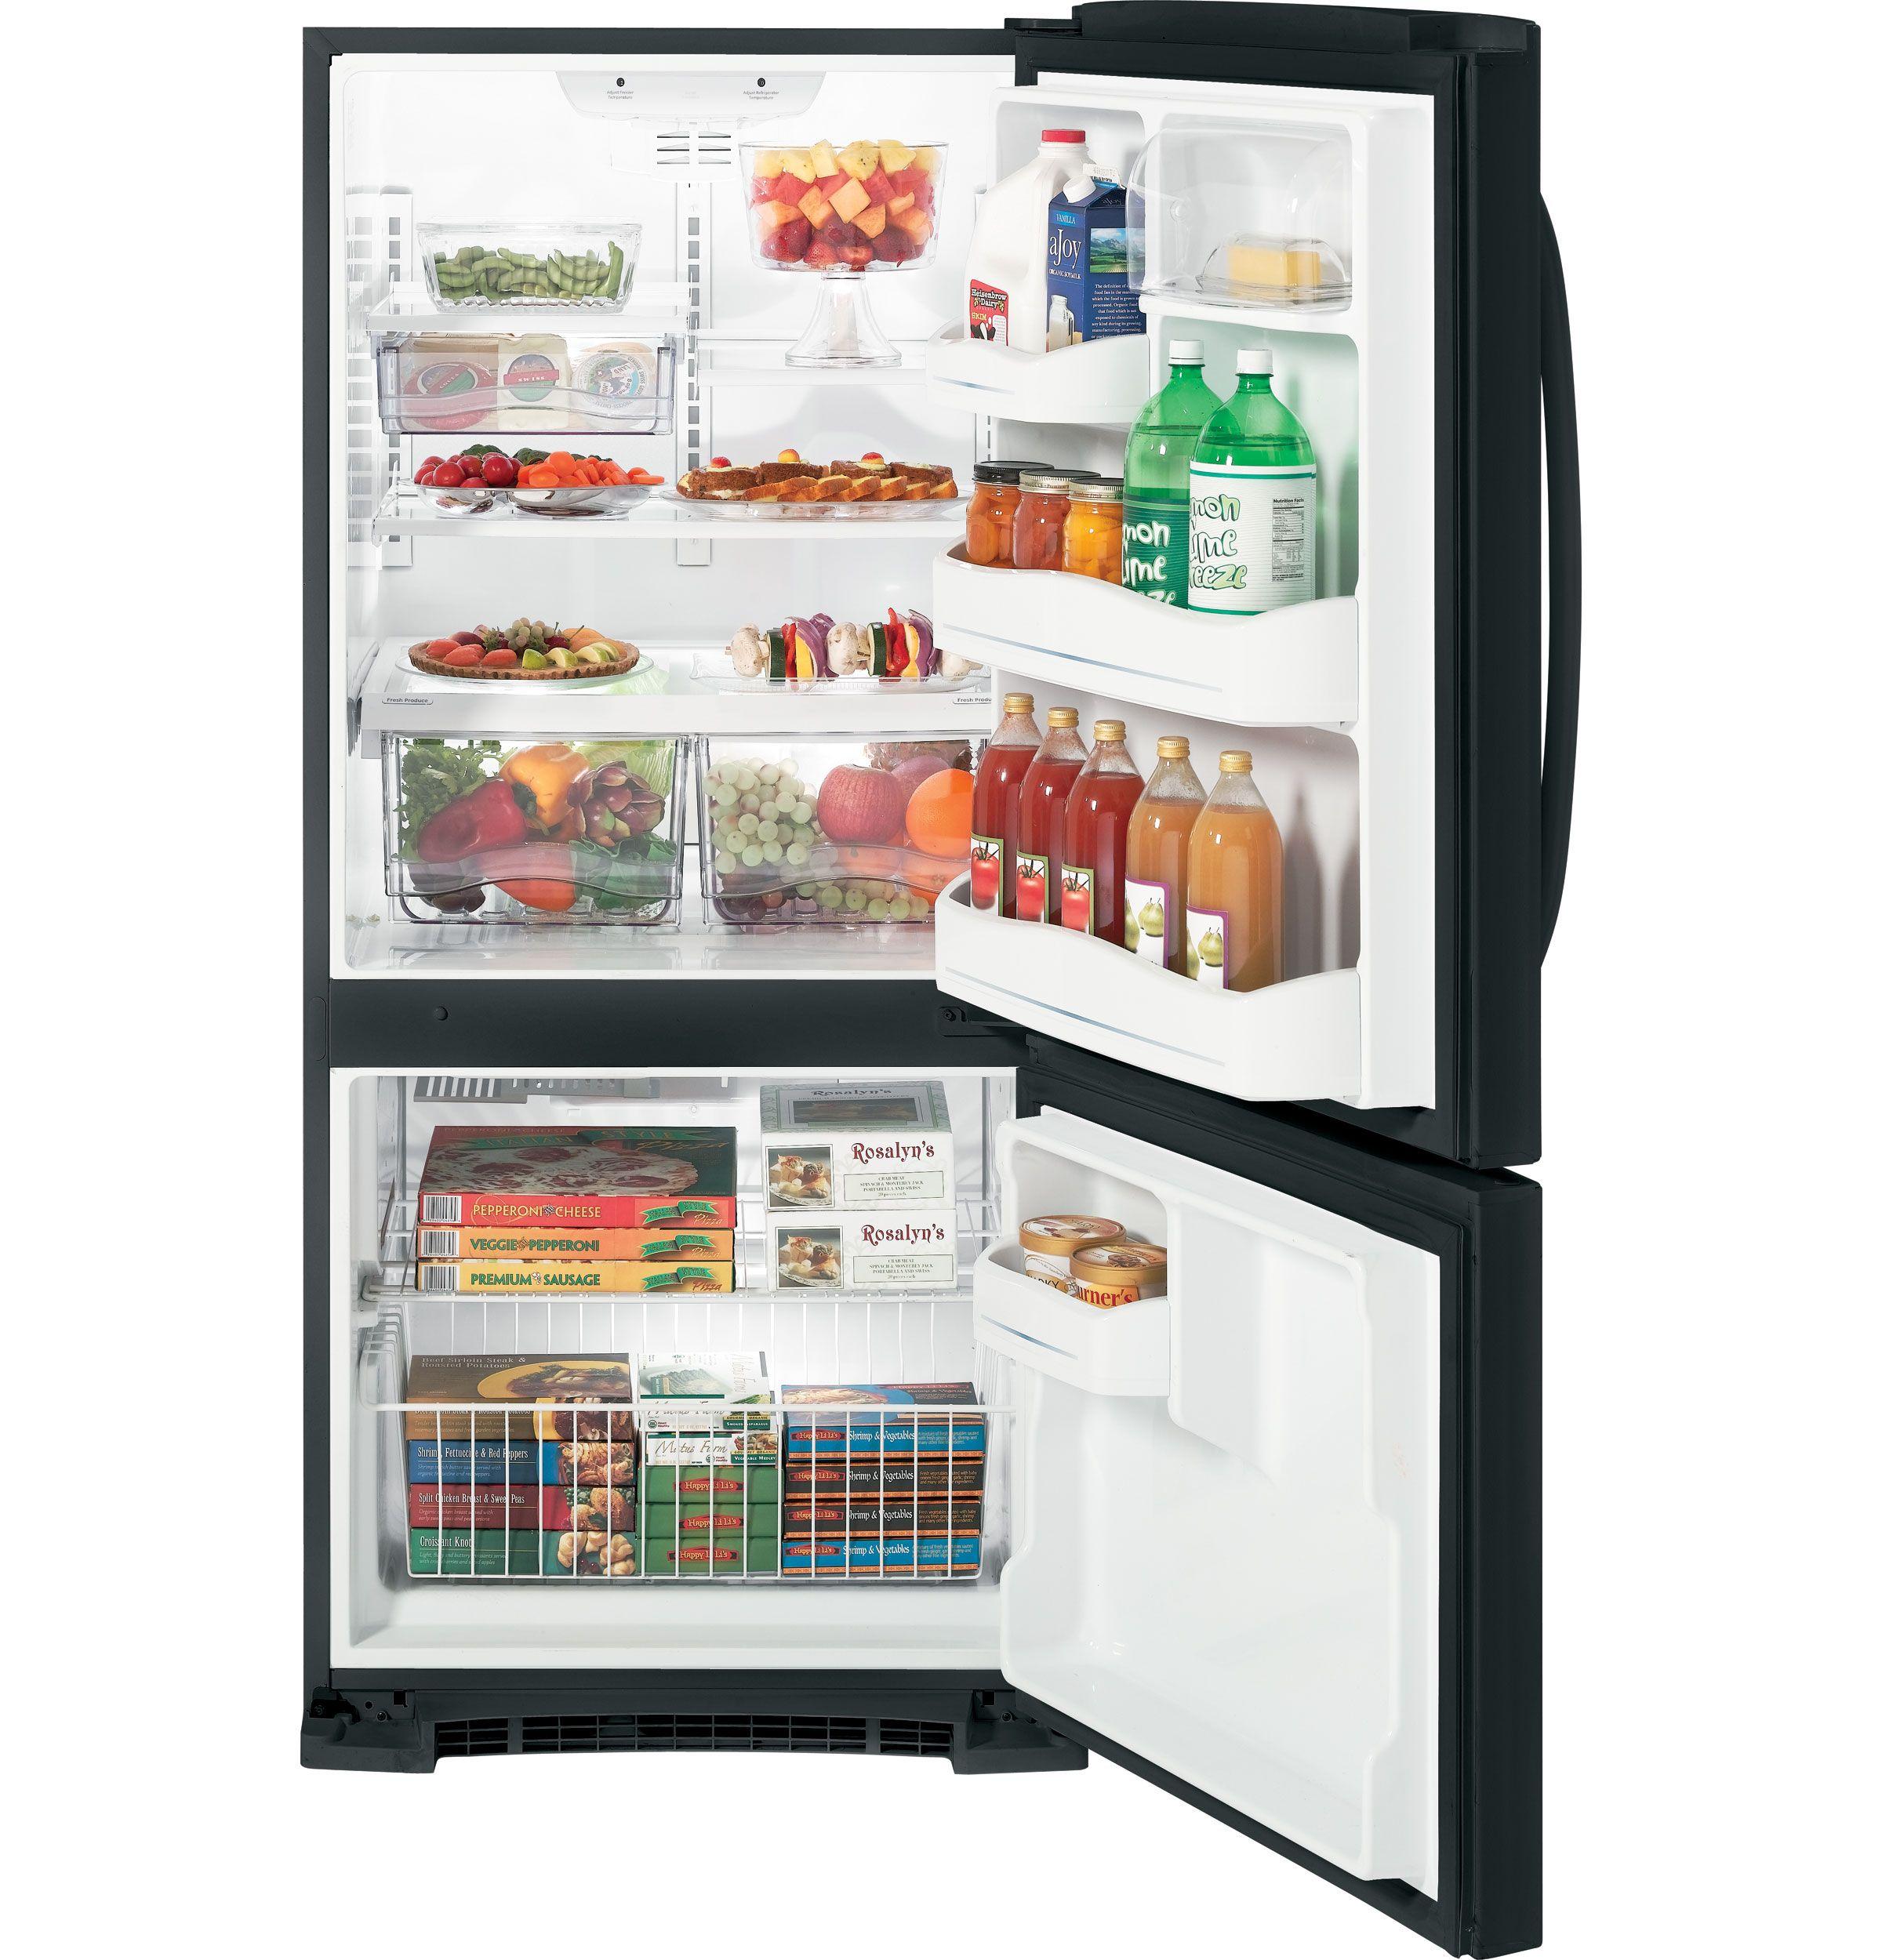 Garage Fridge Ge Energy Star 20 3 Cu Ft Bottom Freezer Refrigerator Gbsc0hbxbb With Images Refrigerator Bottom Freezer Refrigerator Stainless Steel Refrigerator